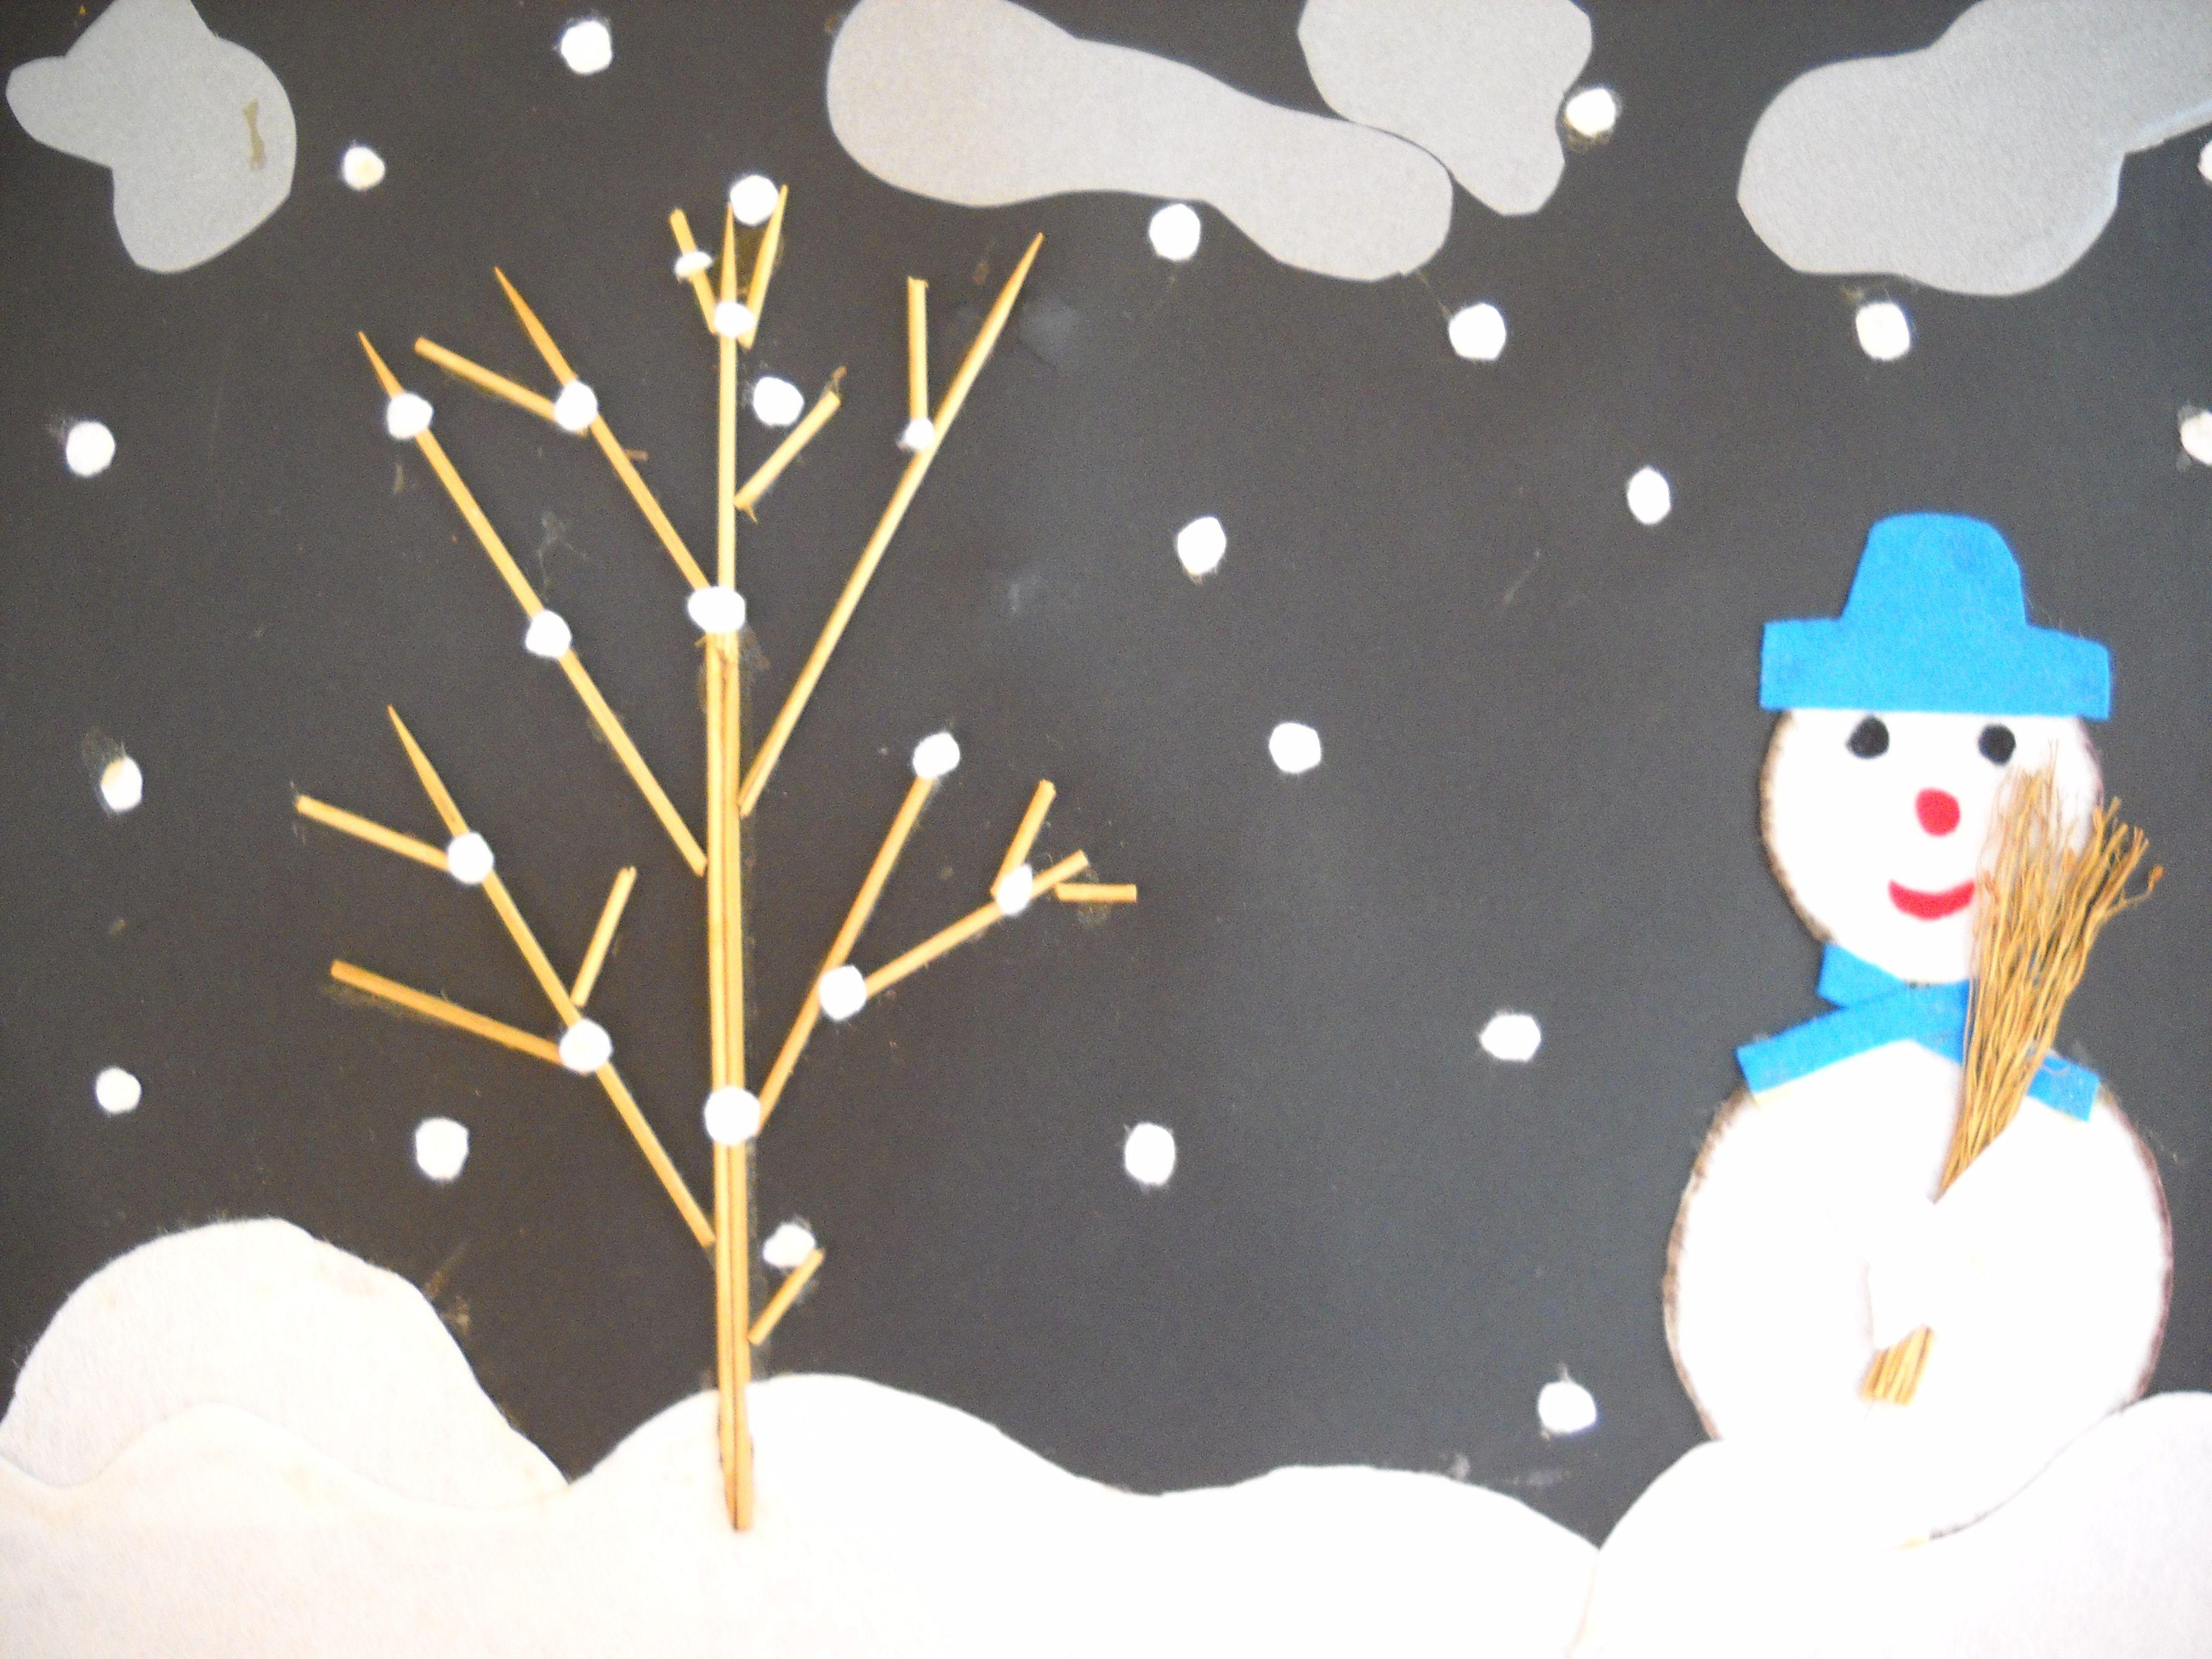 Poesie bambini ~ Autunno fantasia bambini poesia lavori in aula